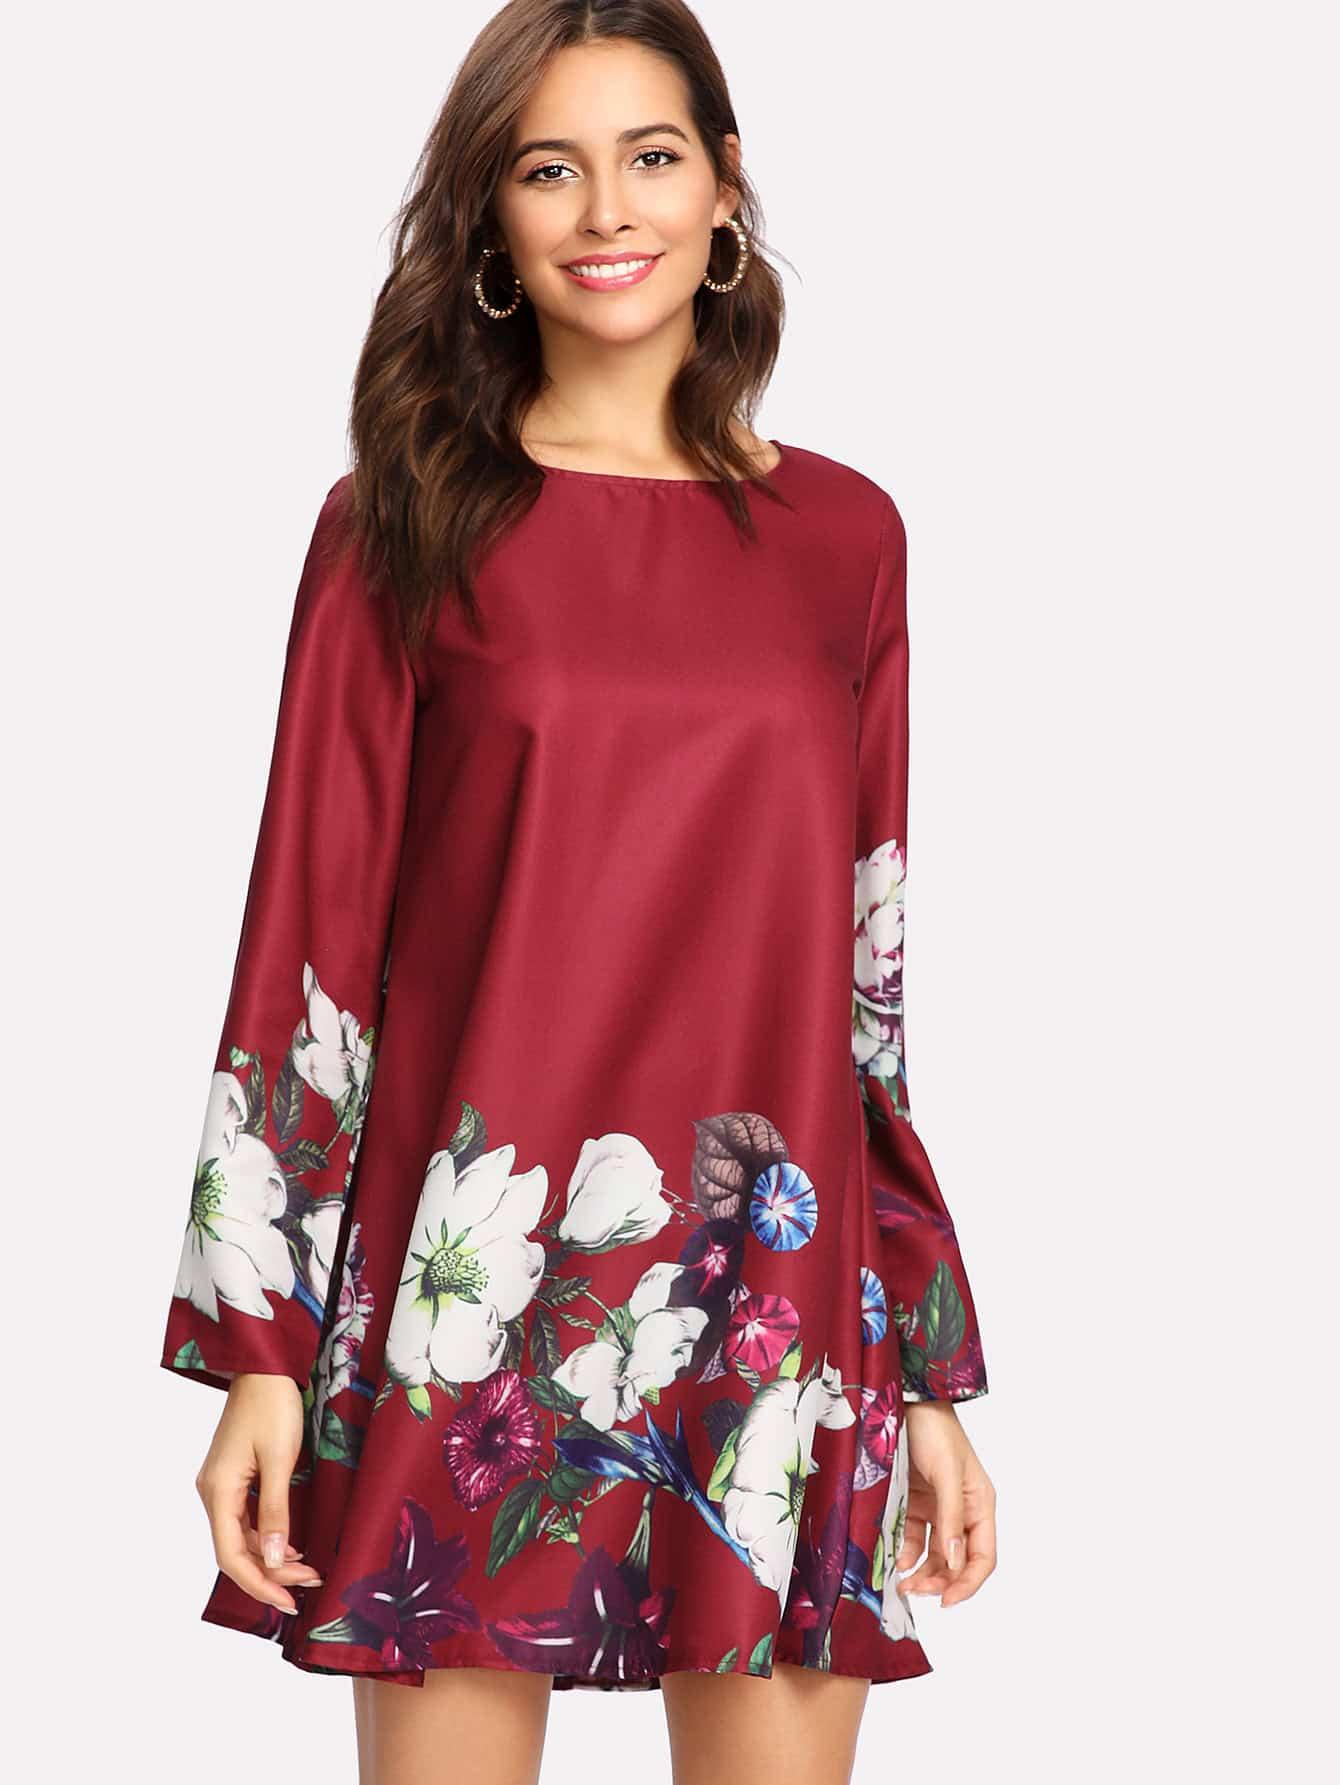 Flower Print Tunic Dress flower print tunic dress